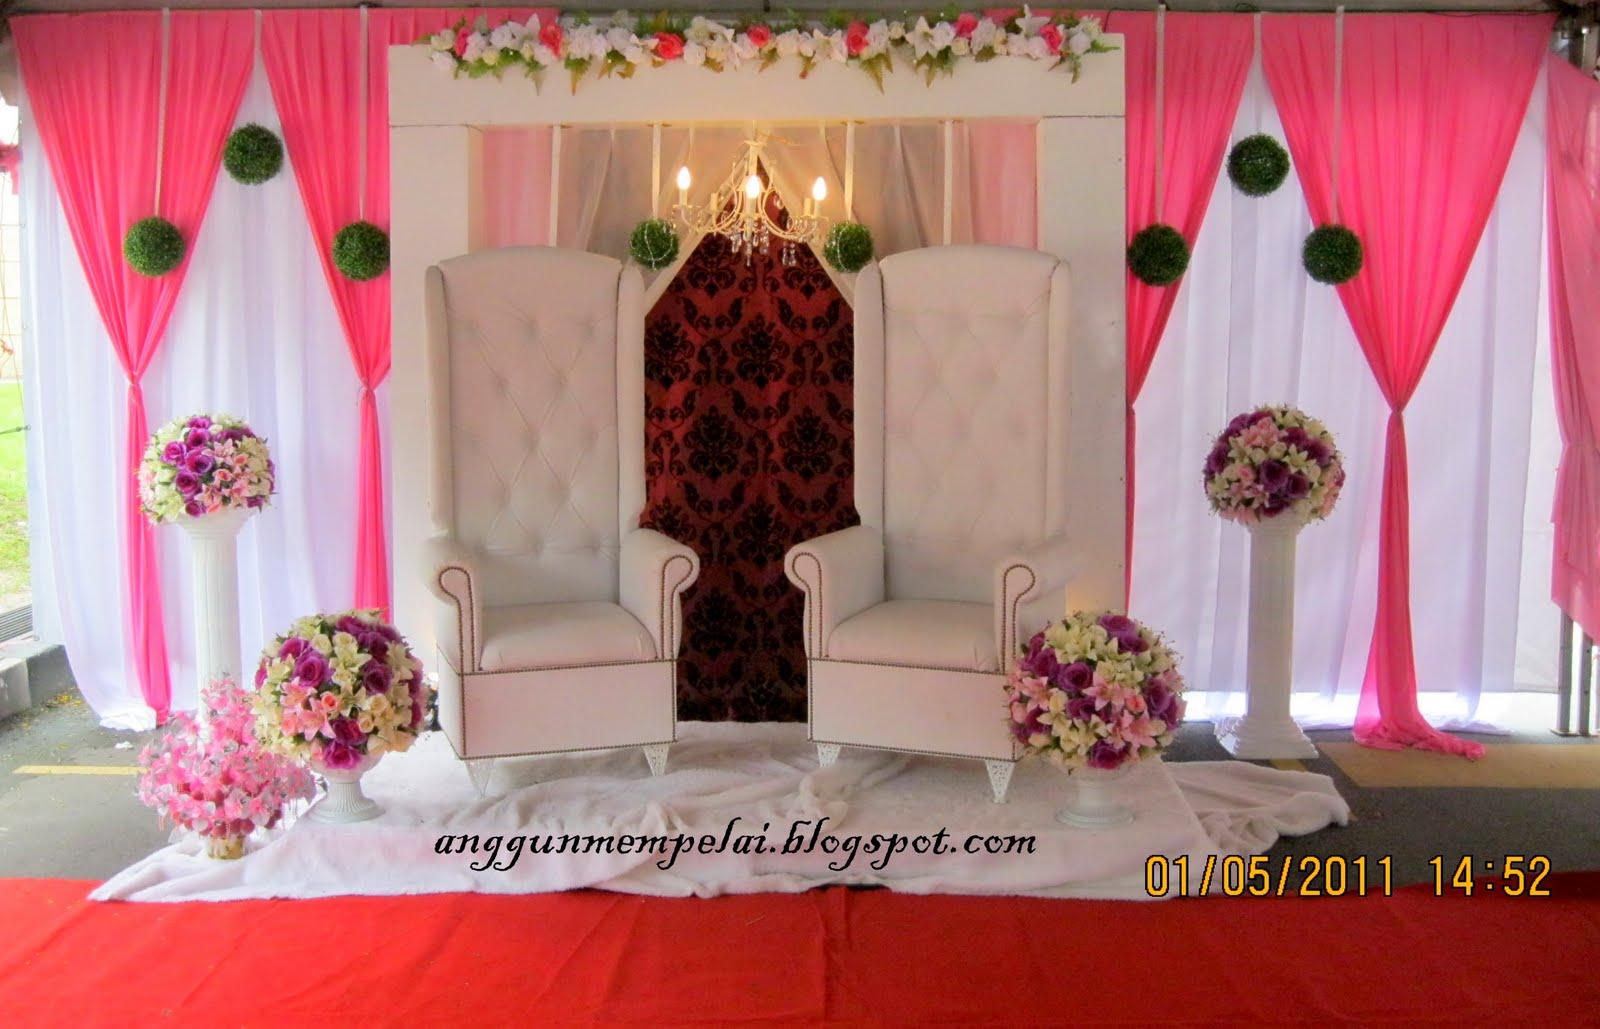 Anggun Mempelai Butik - Memenuhi Citarasa & Bajet Anda. 012-3902581.